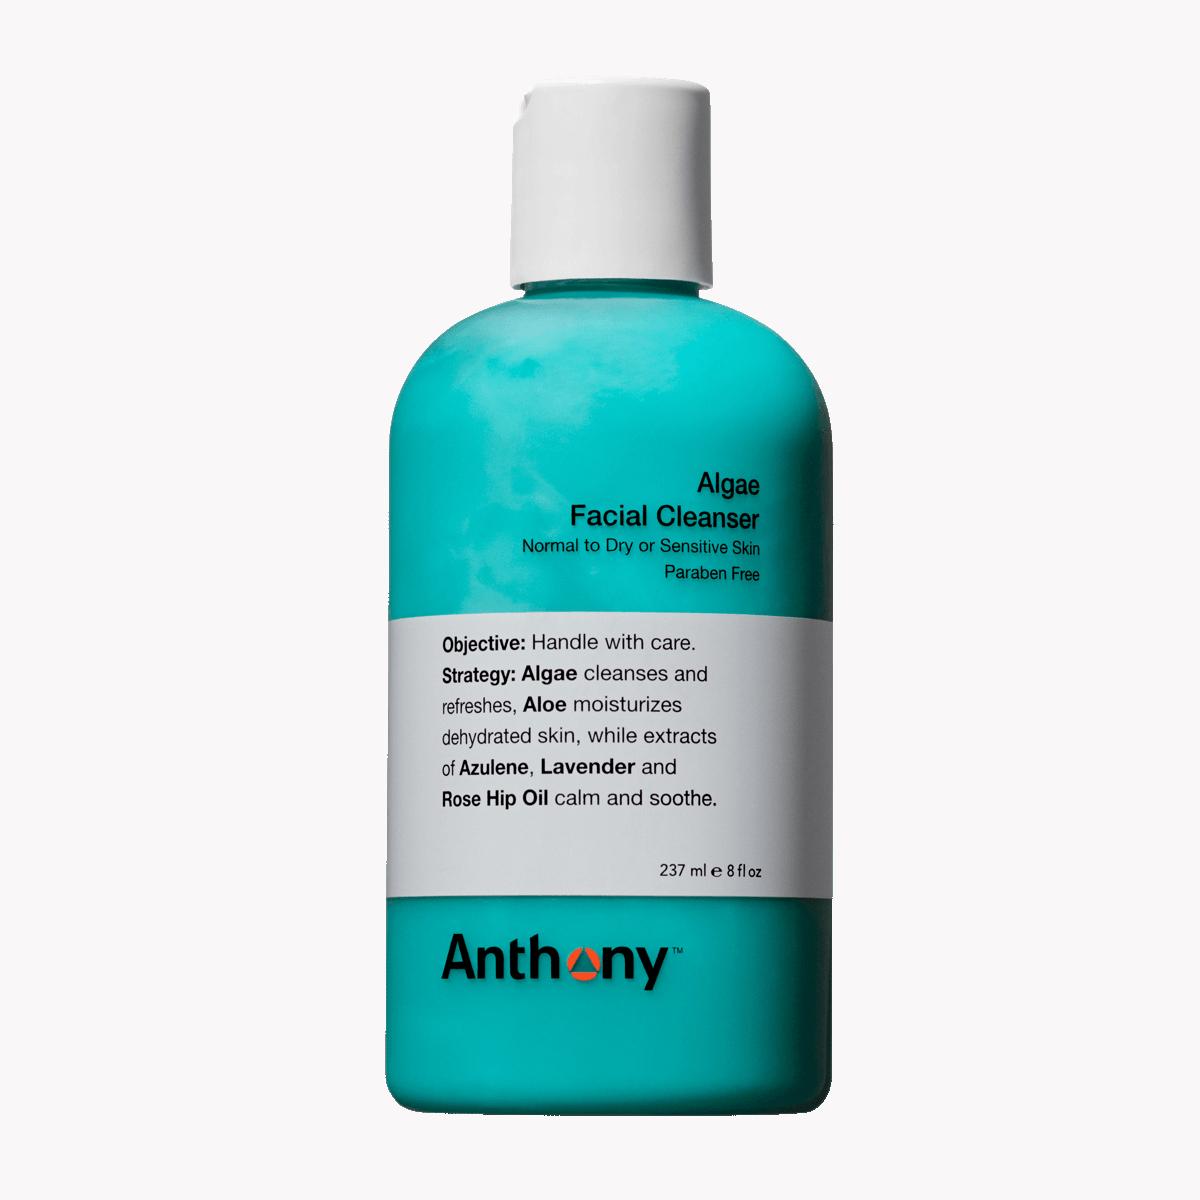 Anthony Algae Facial Cleanser Gesichtsreiniger Sprezstyle